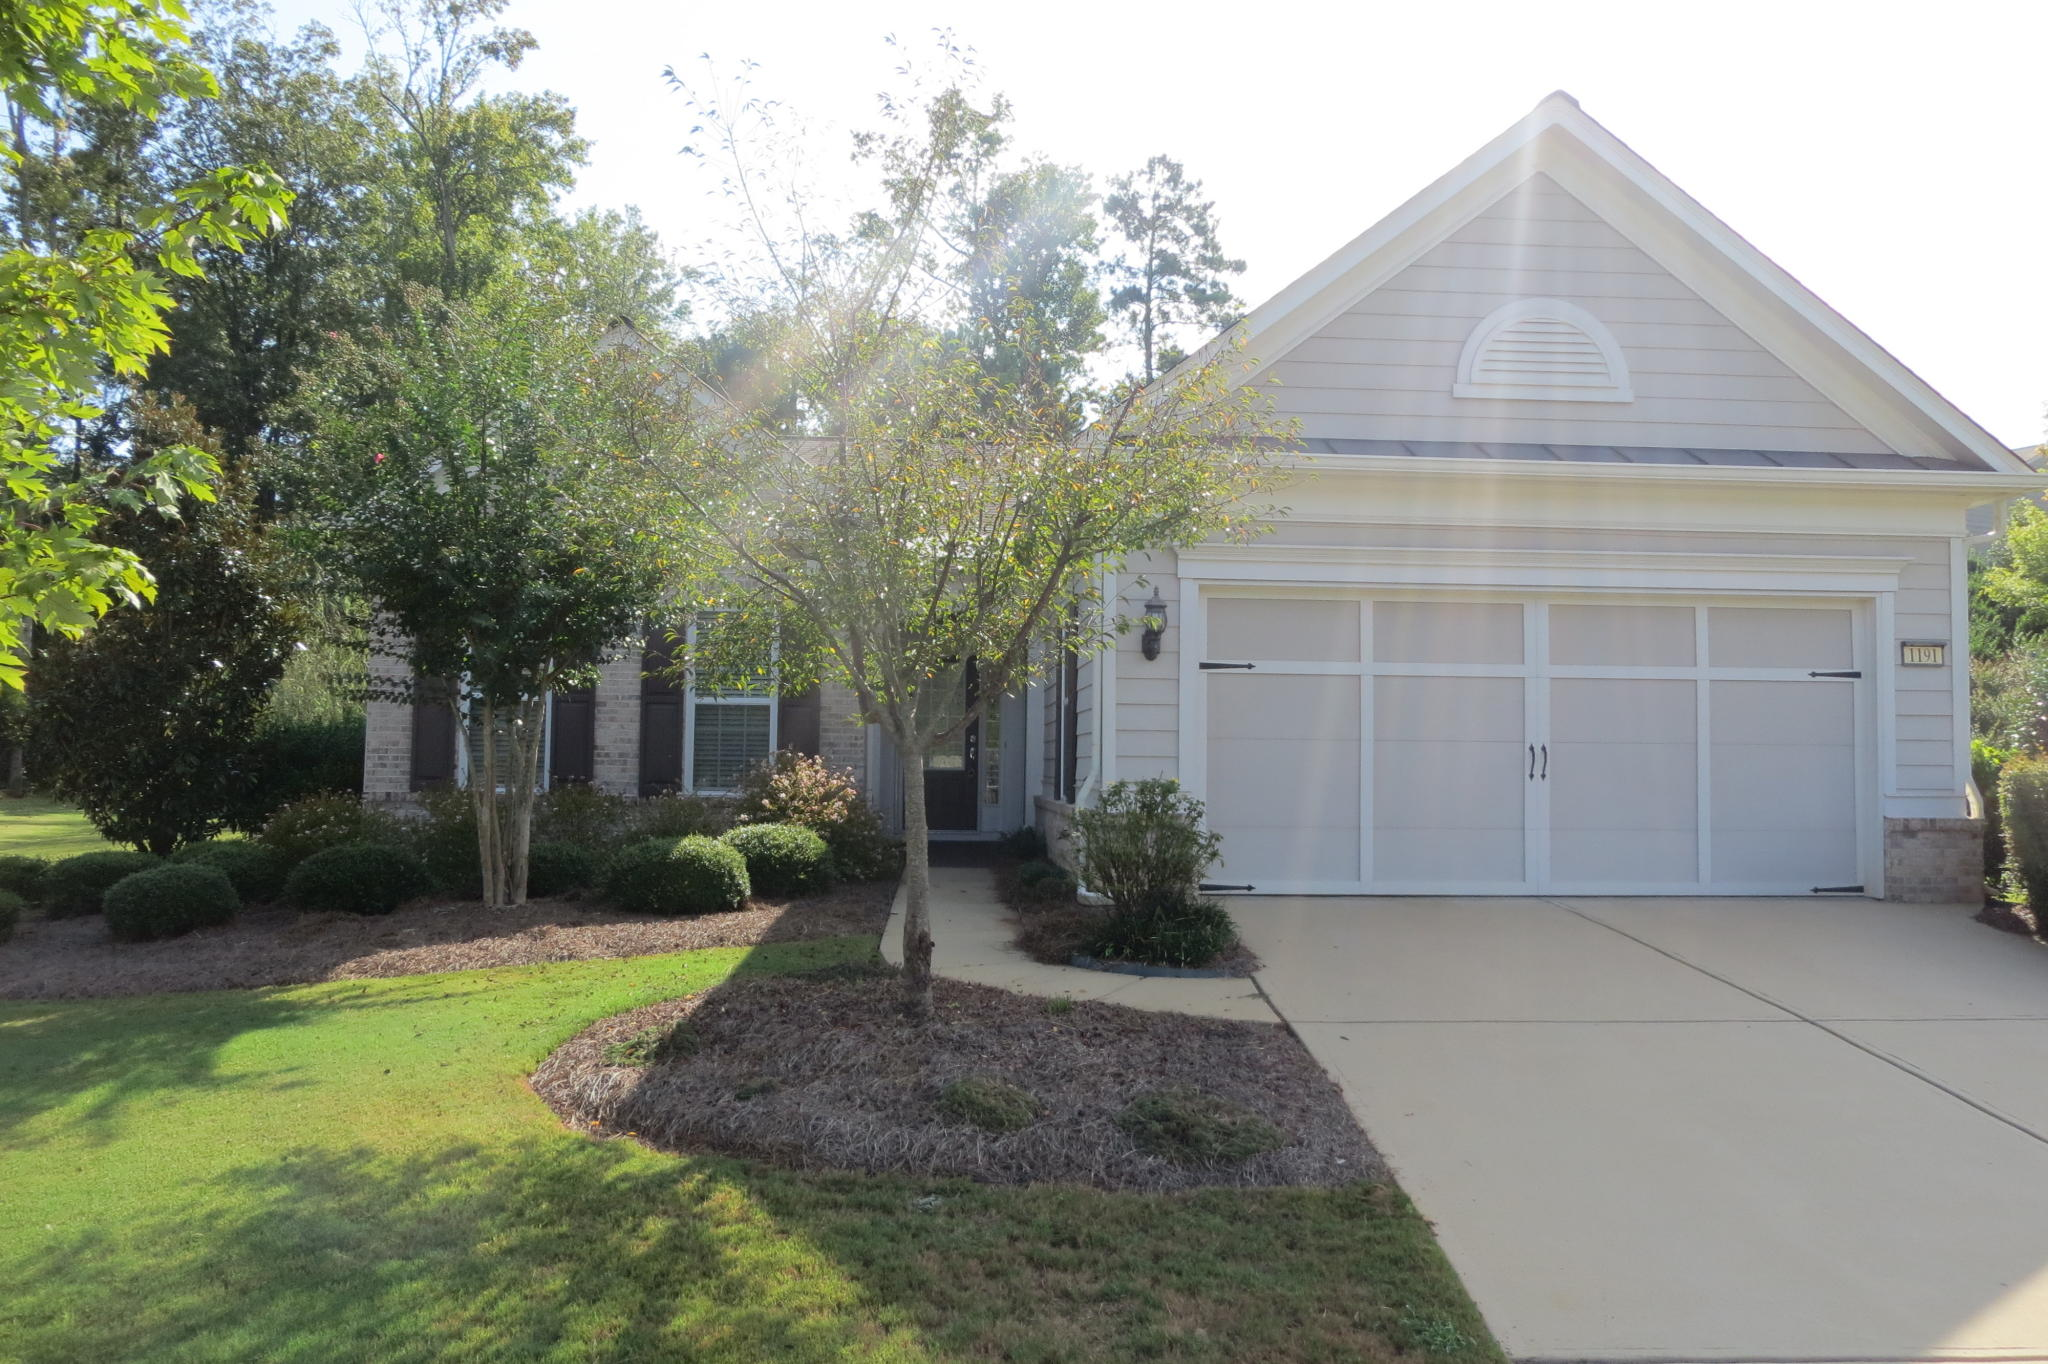 Backyard Paradise Greensboro 1191 seaworthy rd, greensboro, ga 30642   trulia